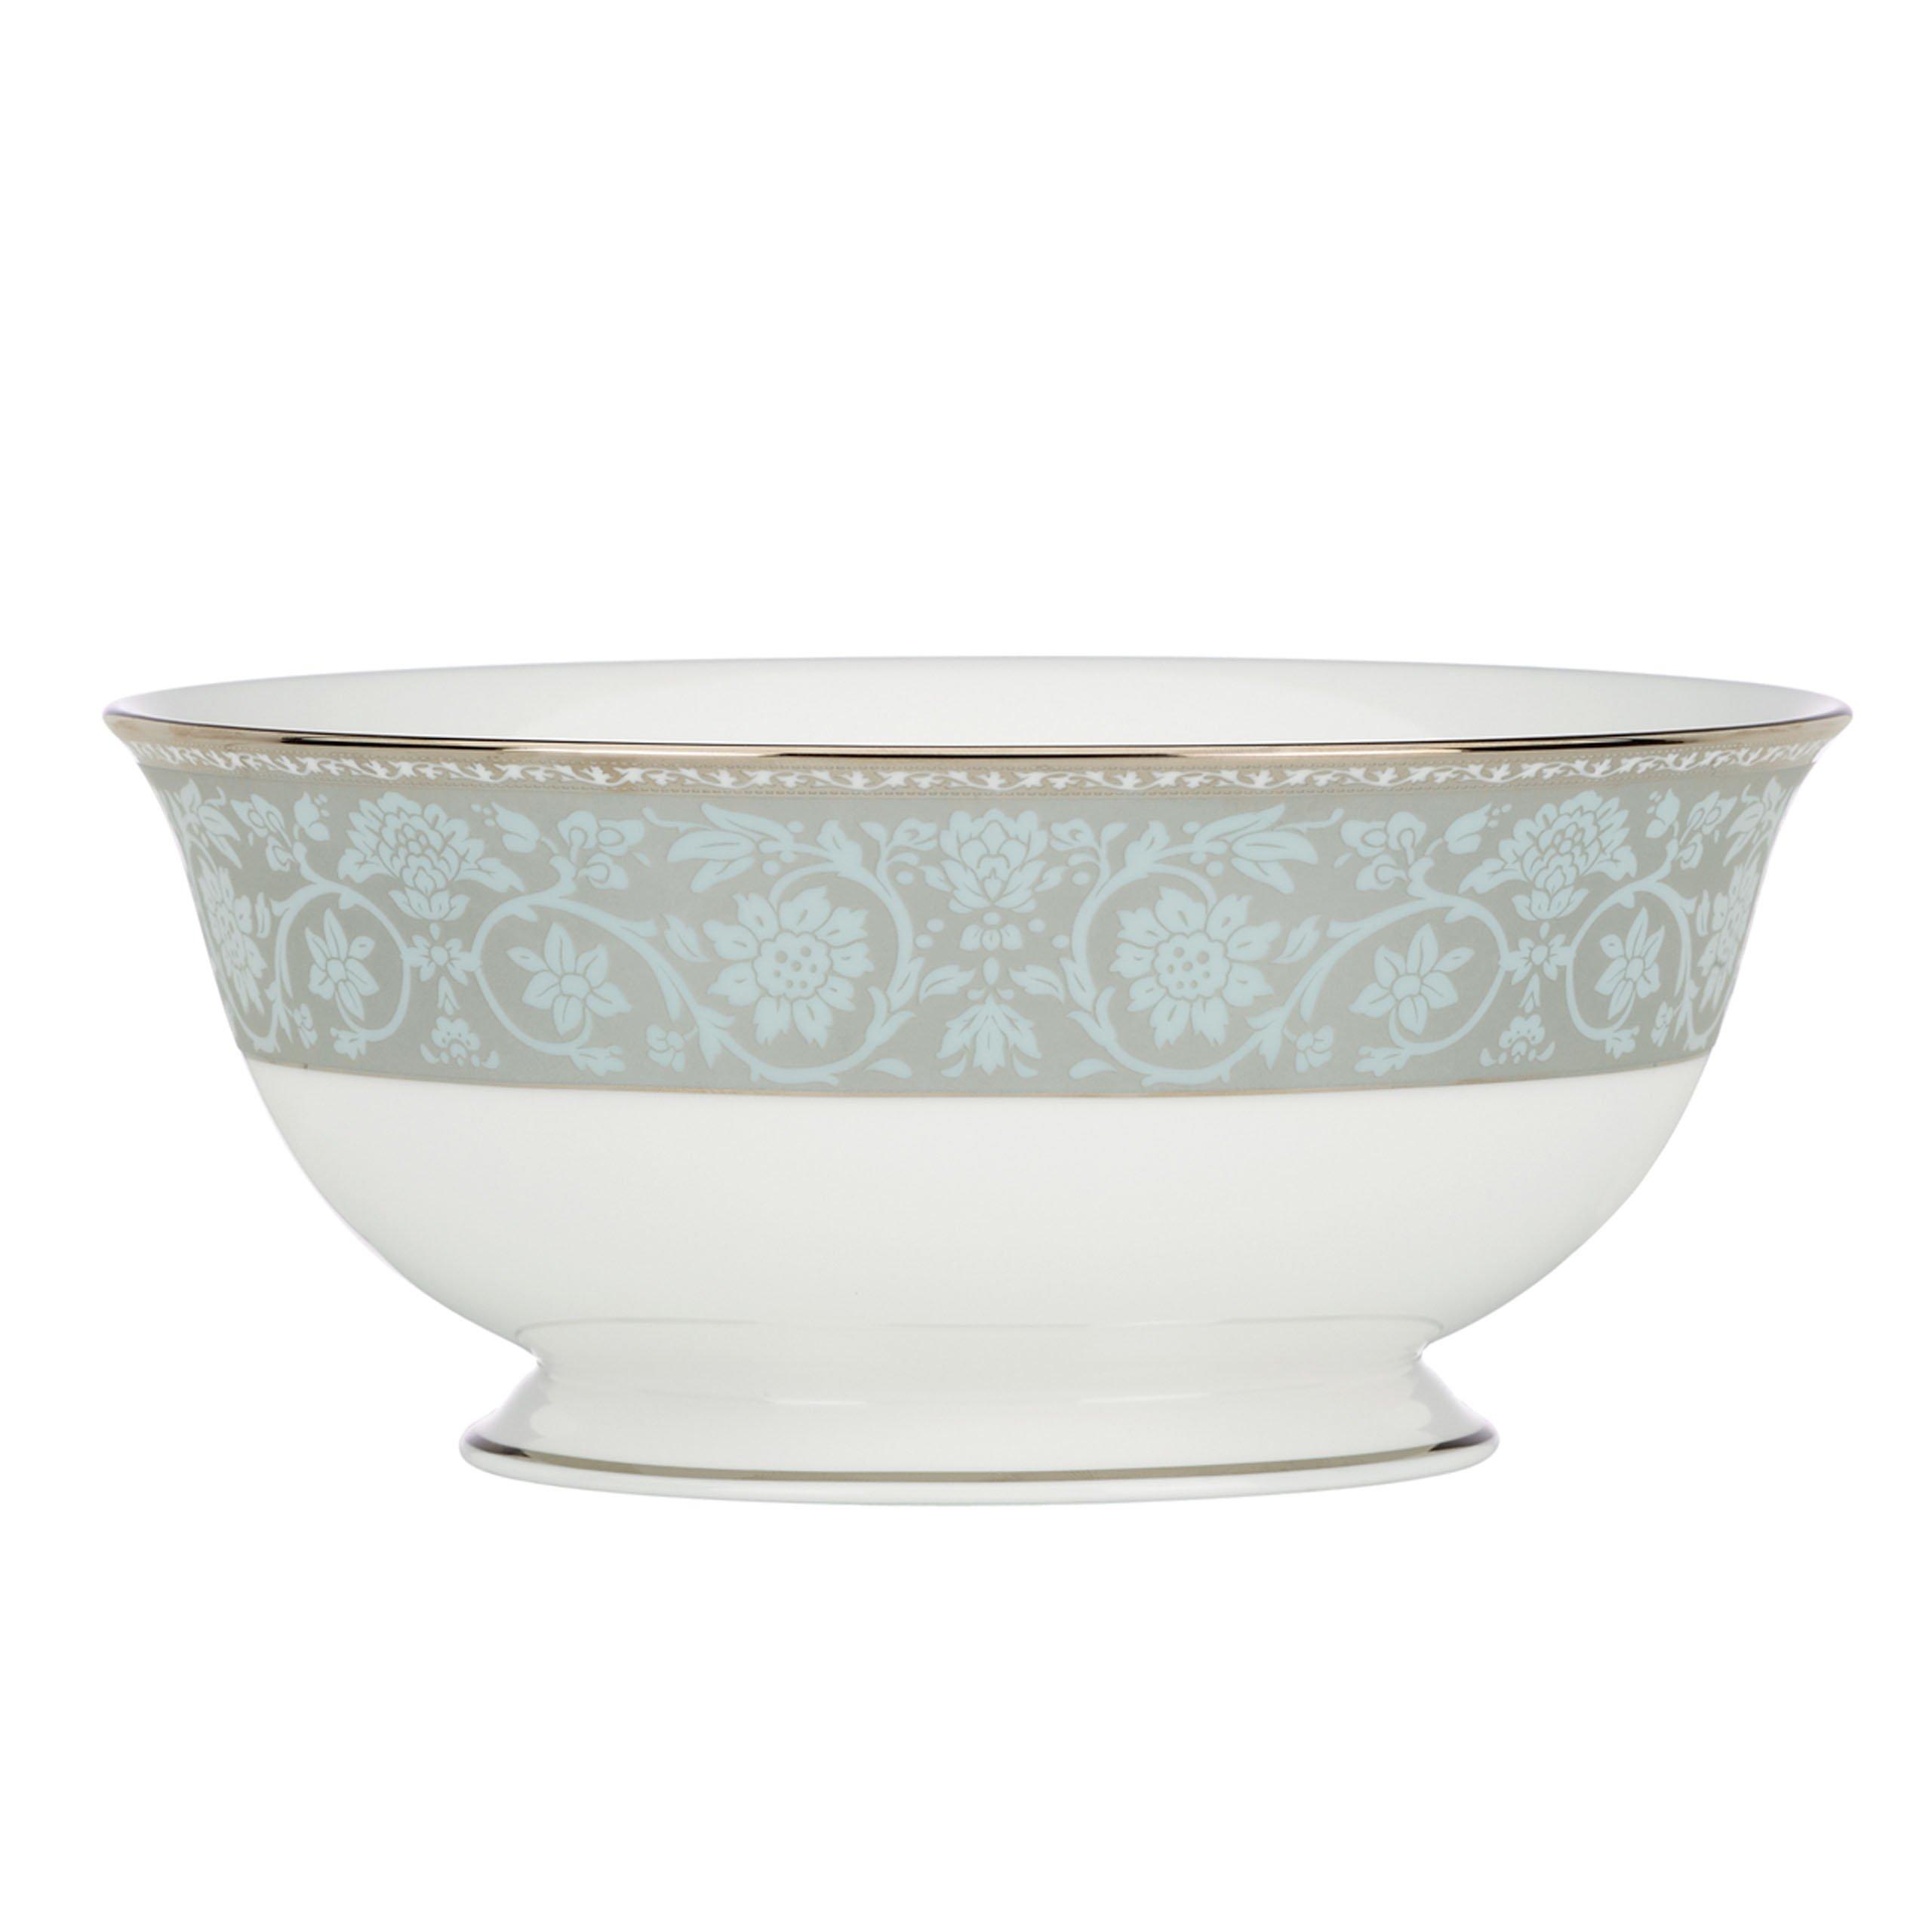 Lenox Westmore Serving Bowl by Lenox